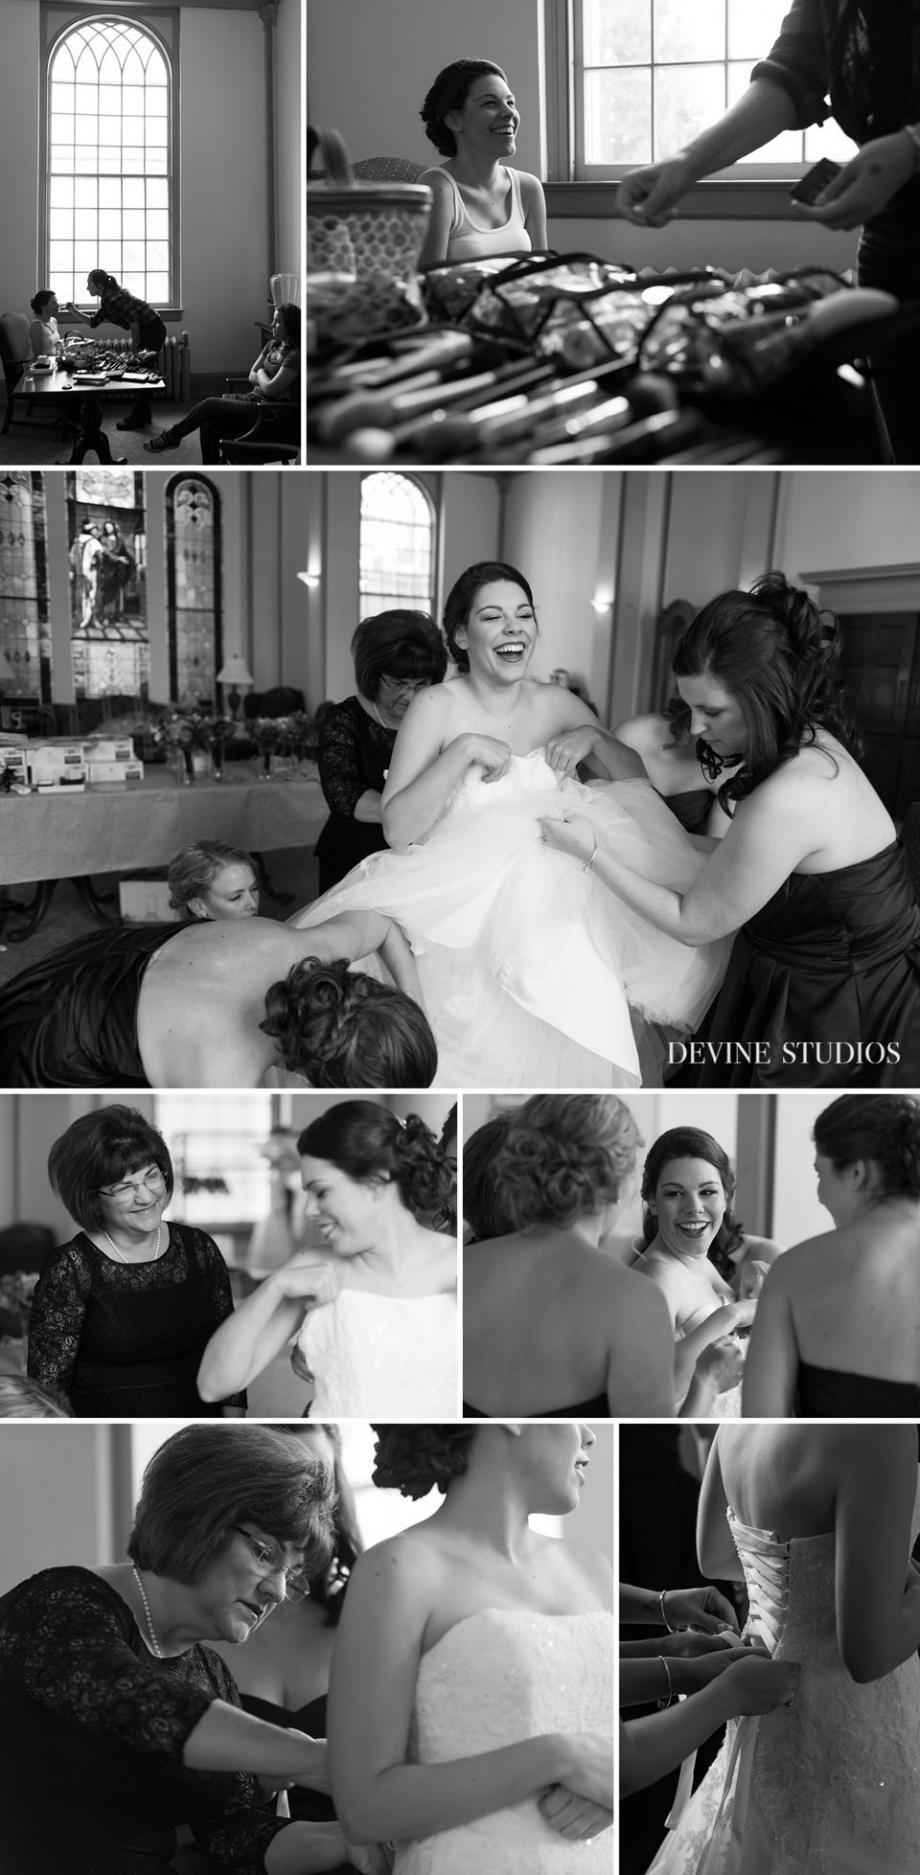 St. Joseph-Wedding-Photography-Kansas City-Photographers-Devine Studios 2